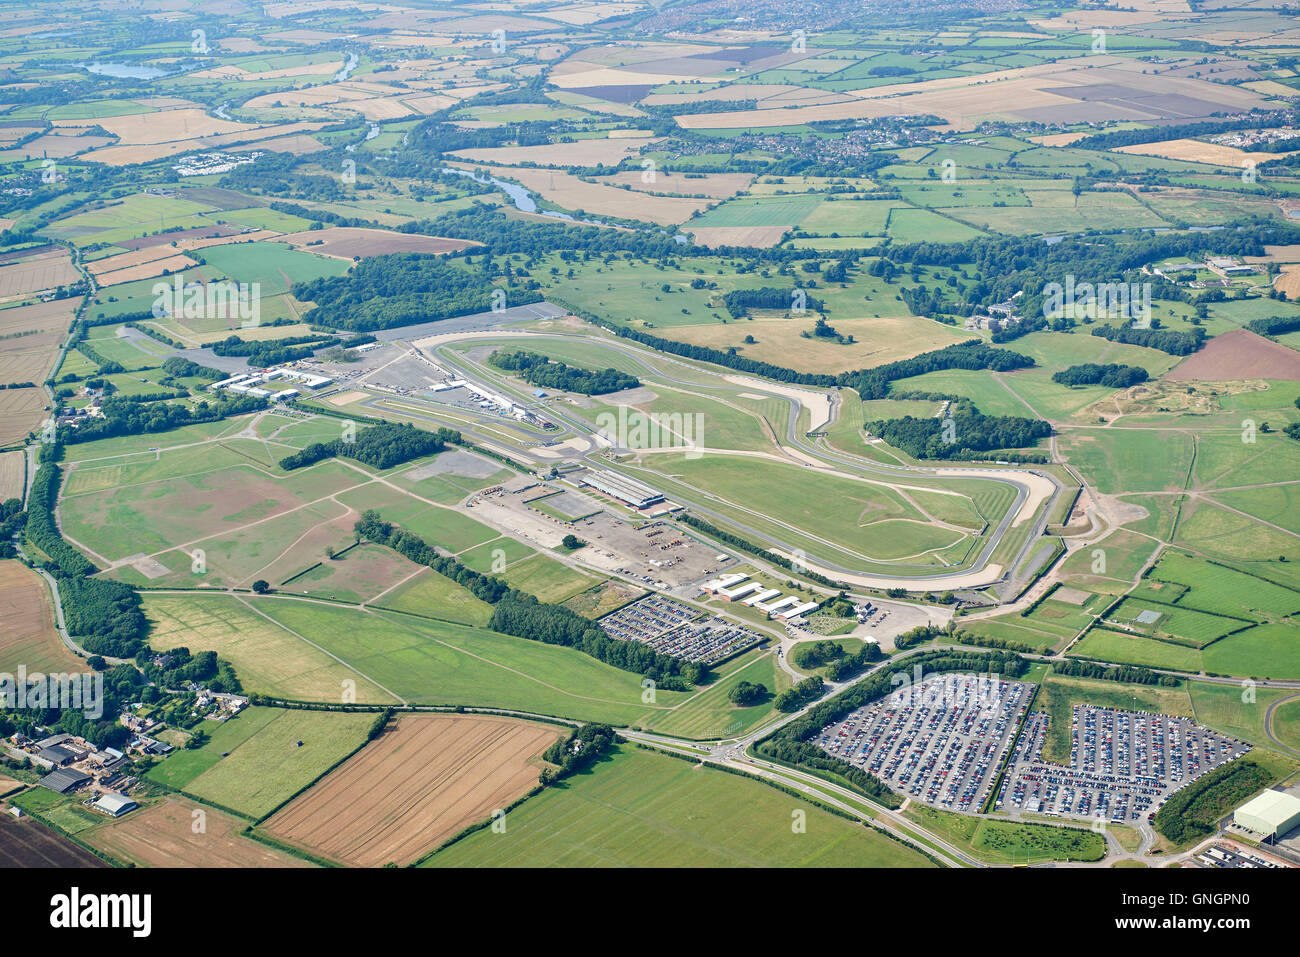 Donnington Park, Motor Racing Circuit, East Midlands, England, UK - Stock Image